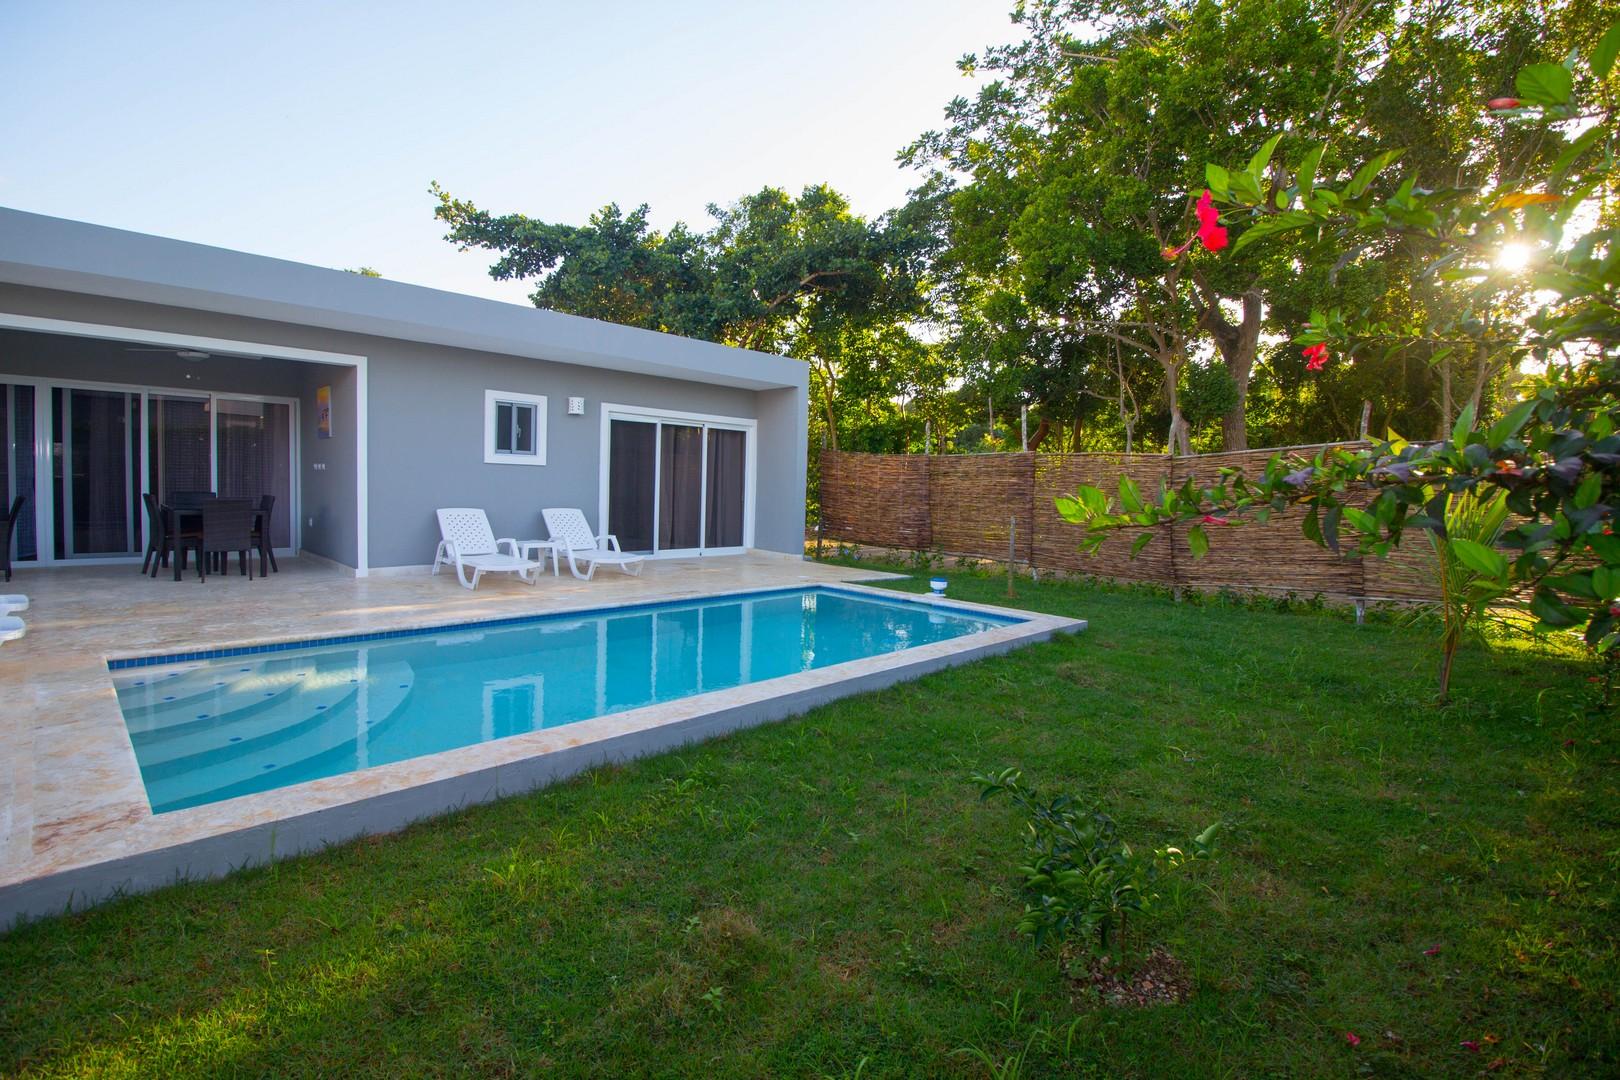 Residencial Casa Linda - 2 Bedroom Villas